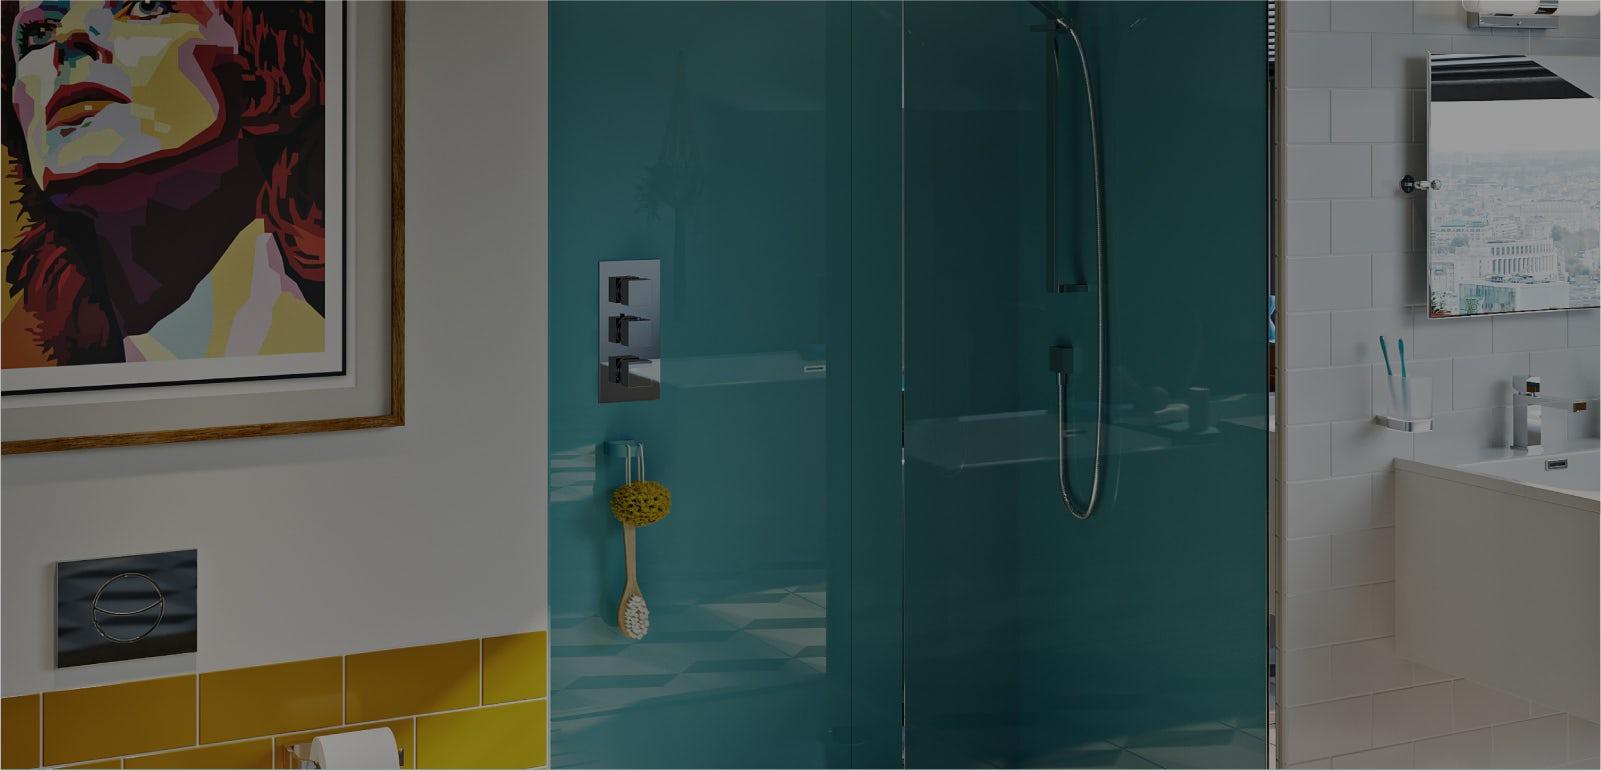 Bathroom ideas: New Retro part 3